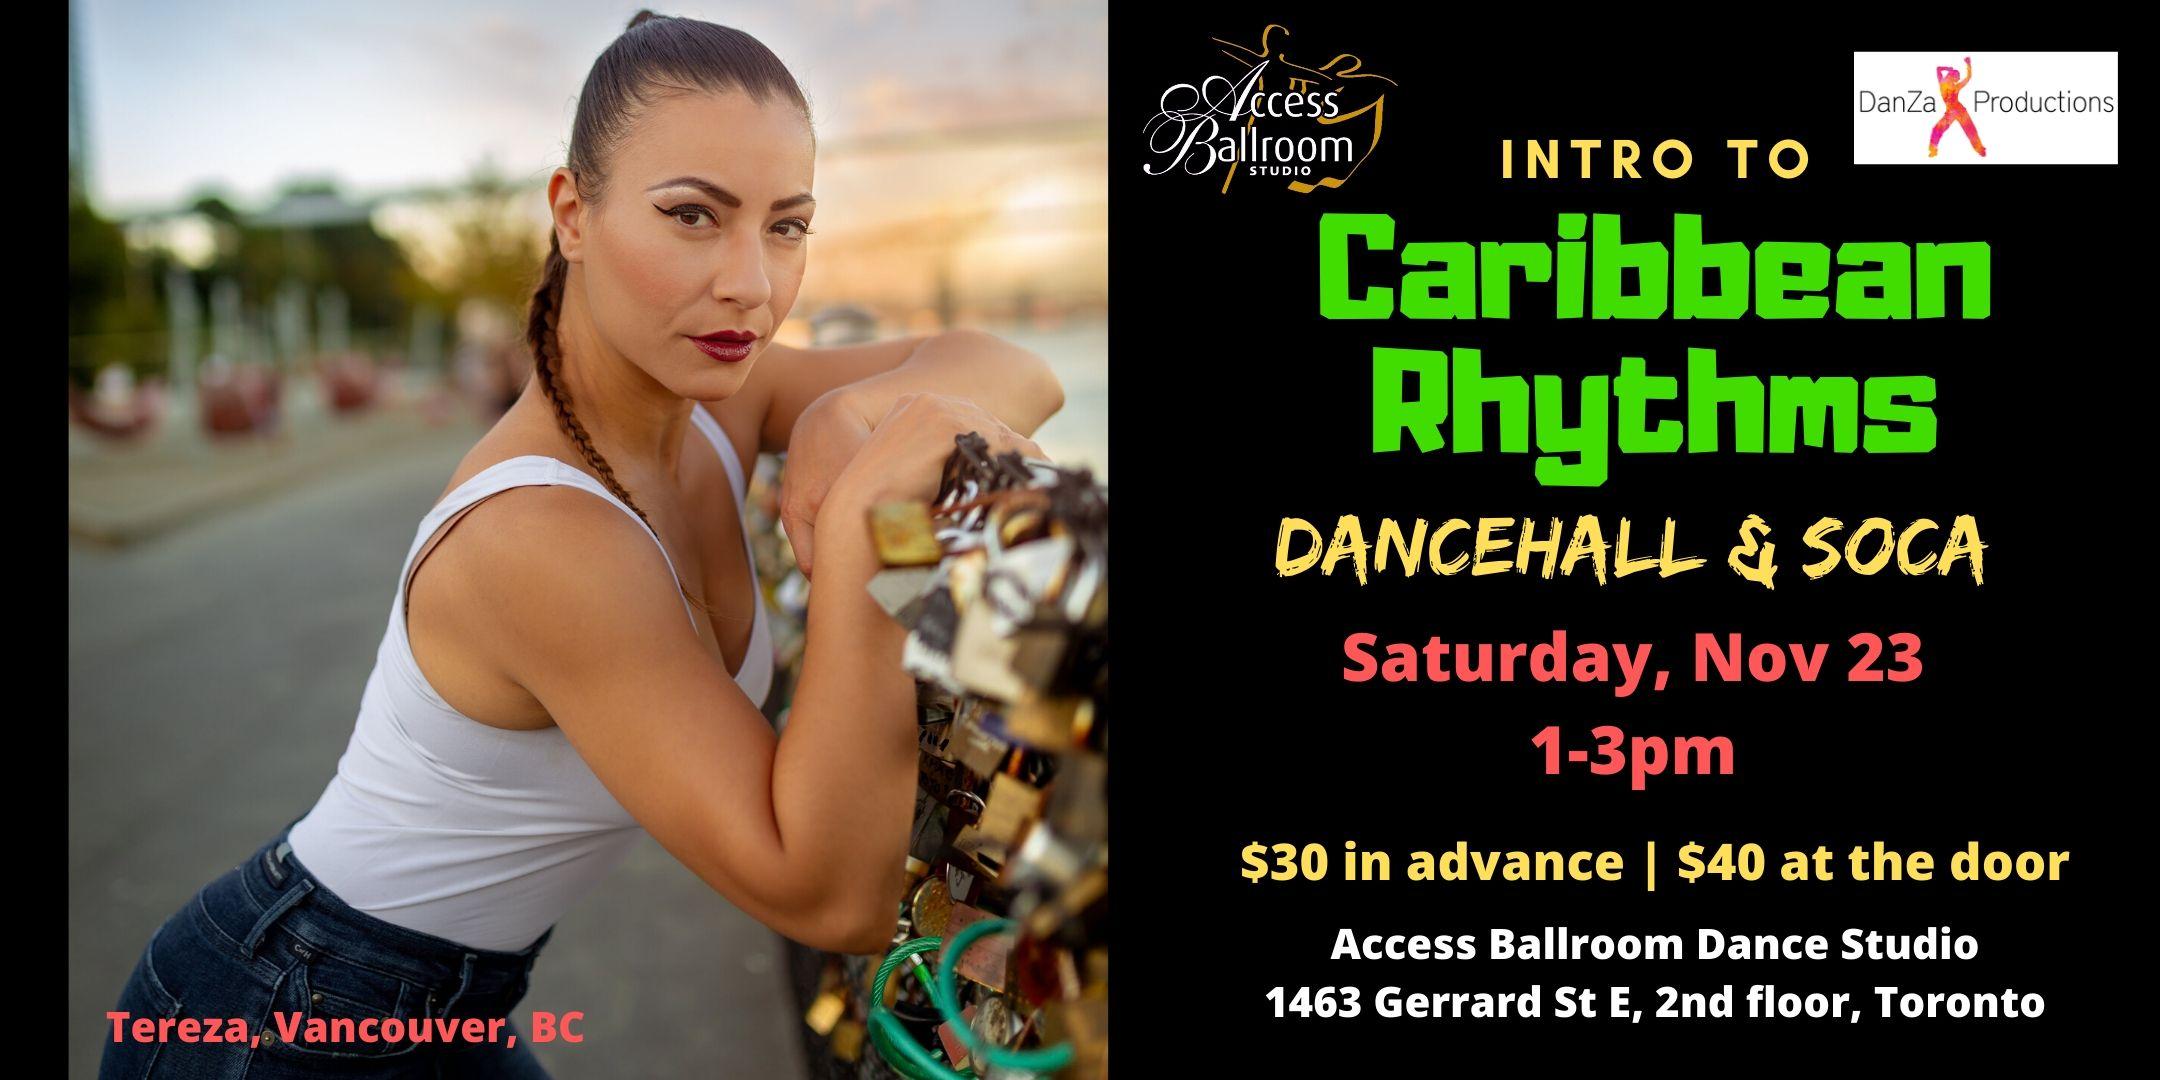 caribbean rhythms dancehall soca reggae calypso